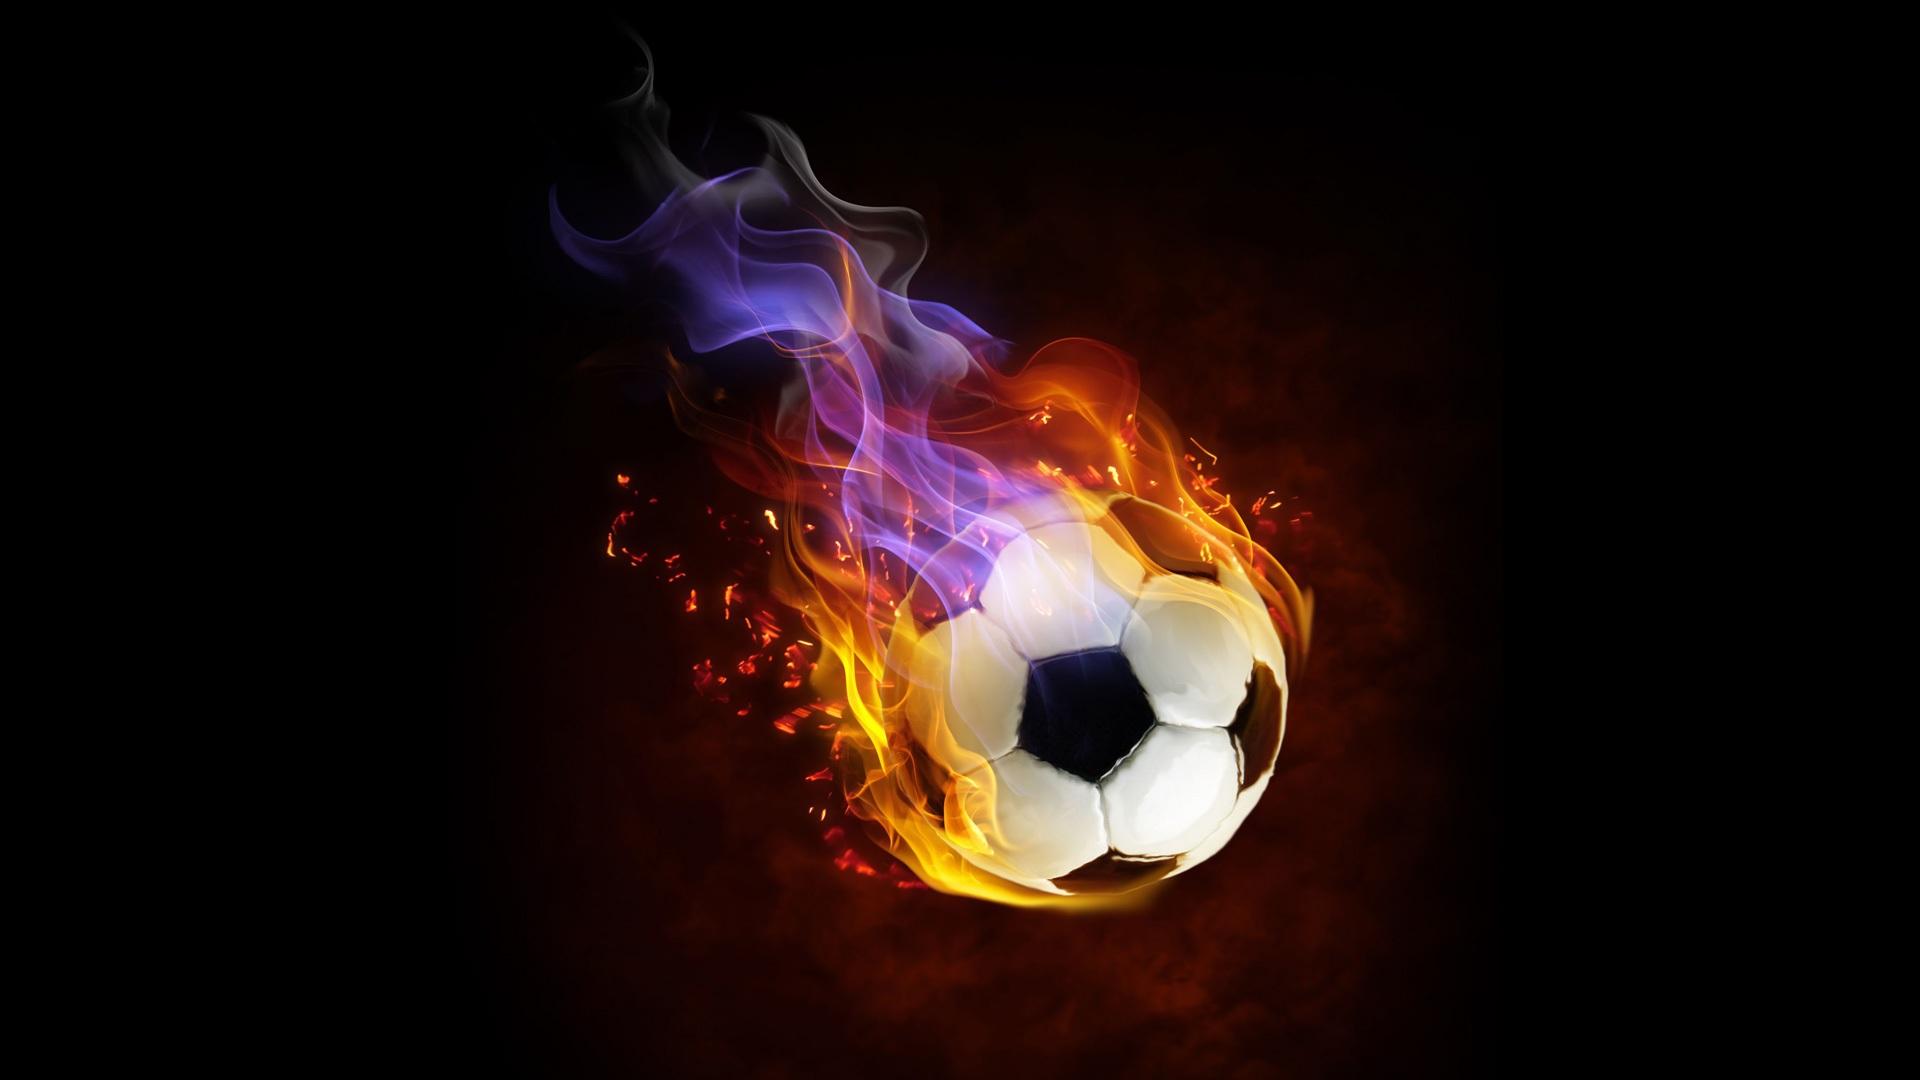 SoccerFootball 1920x1080